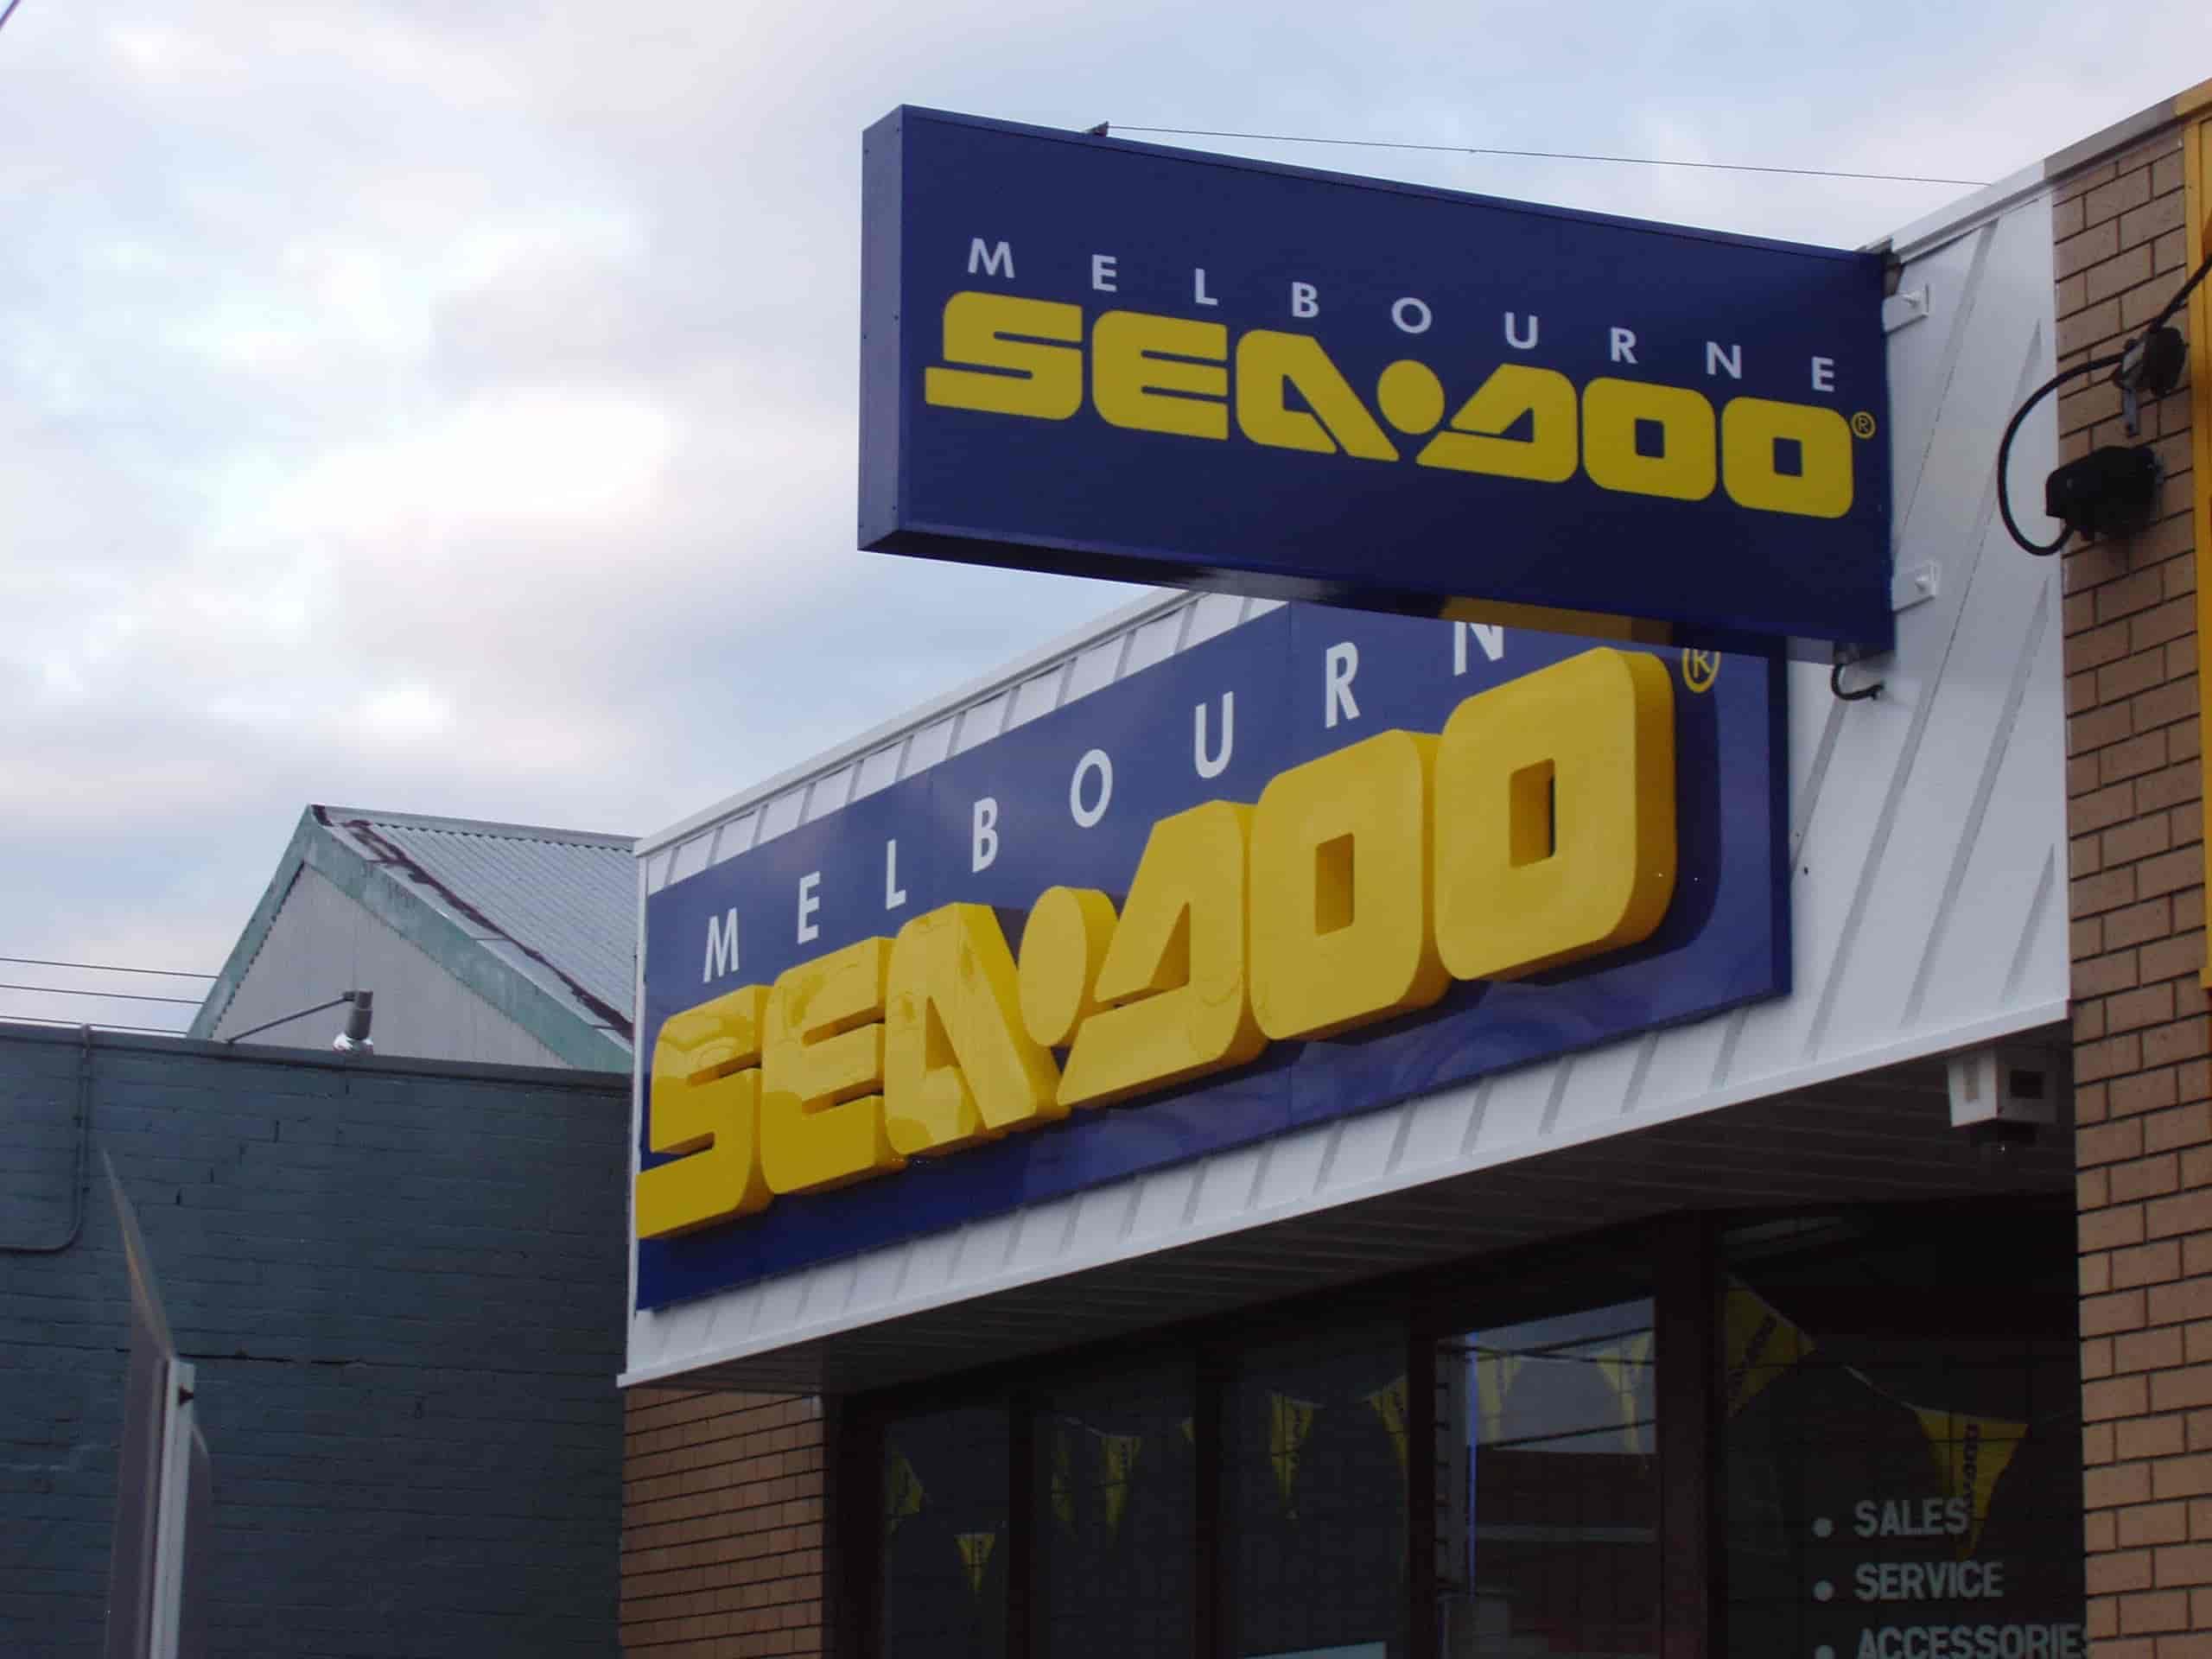 Illuminated signs Sendoo